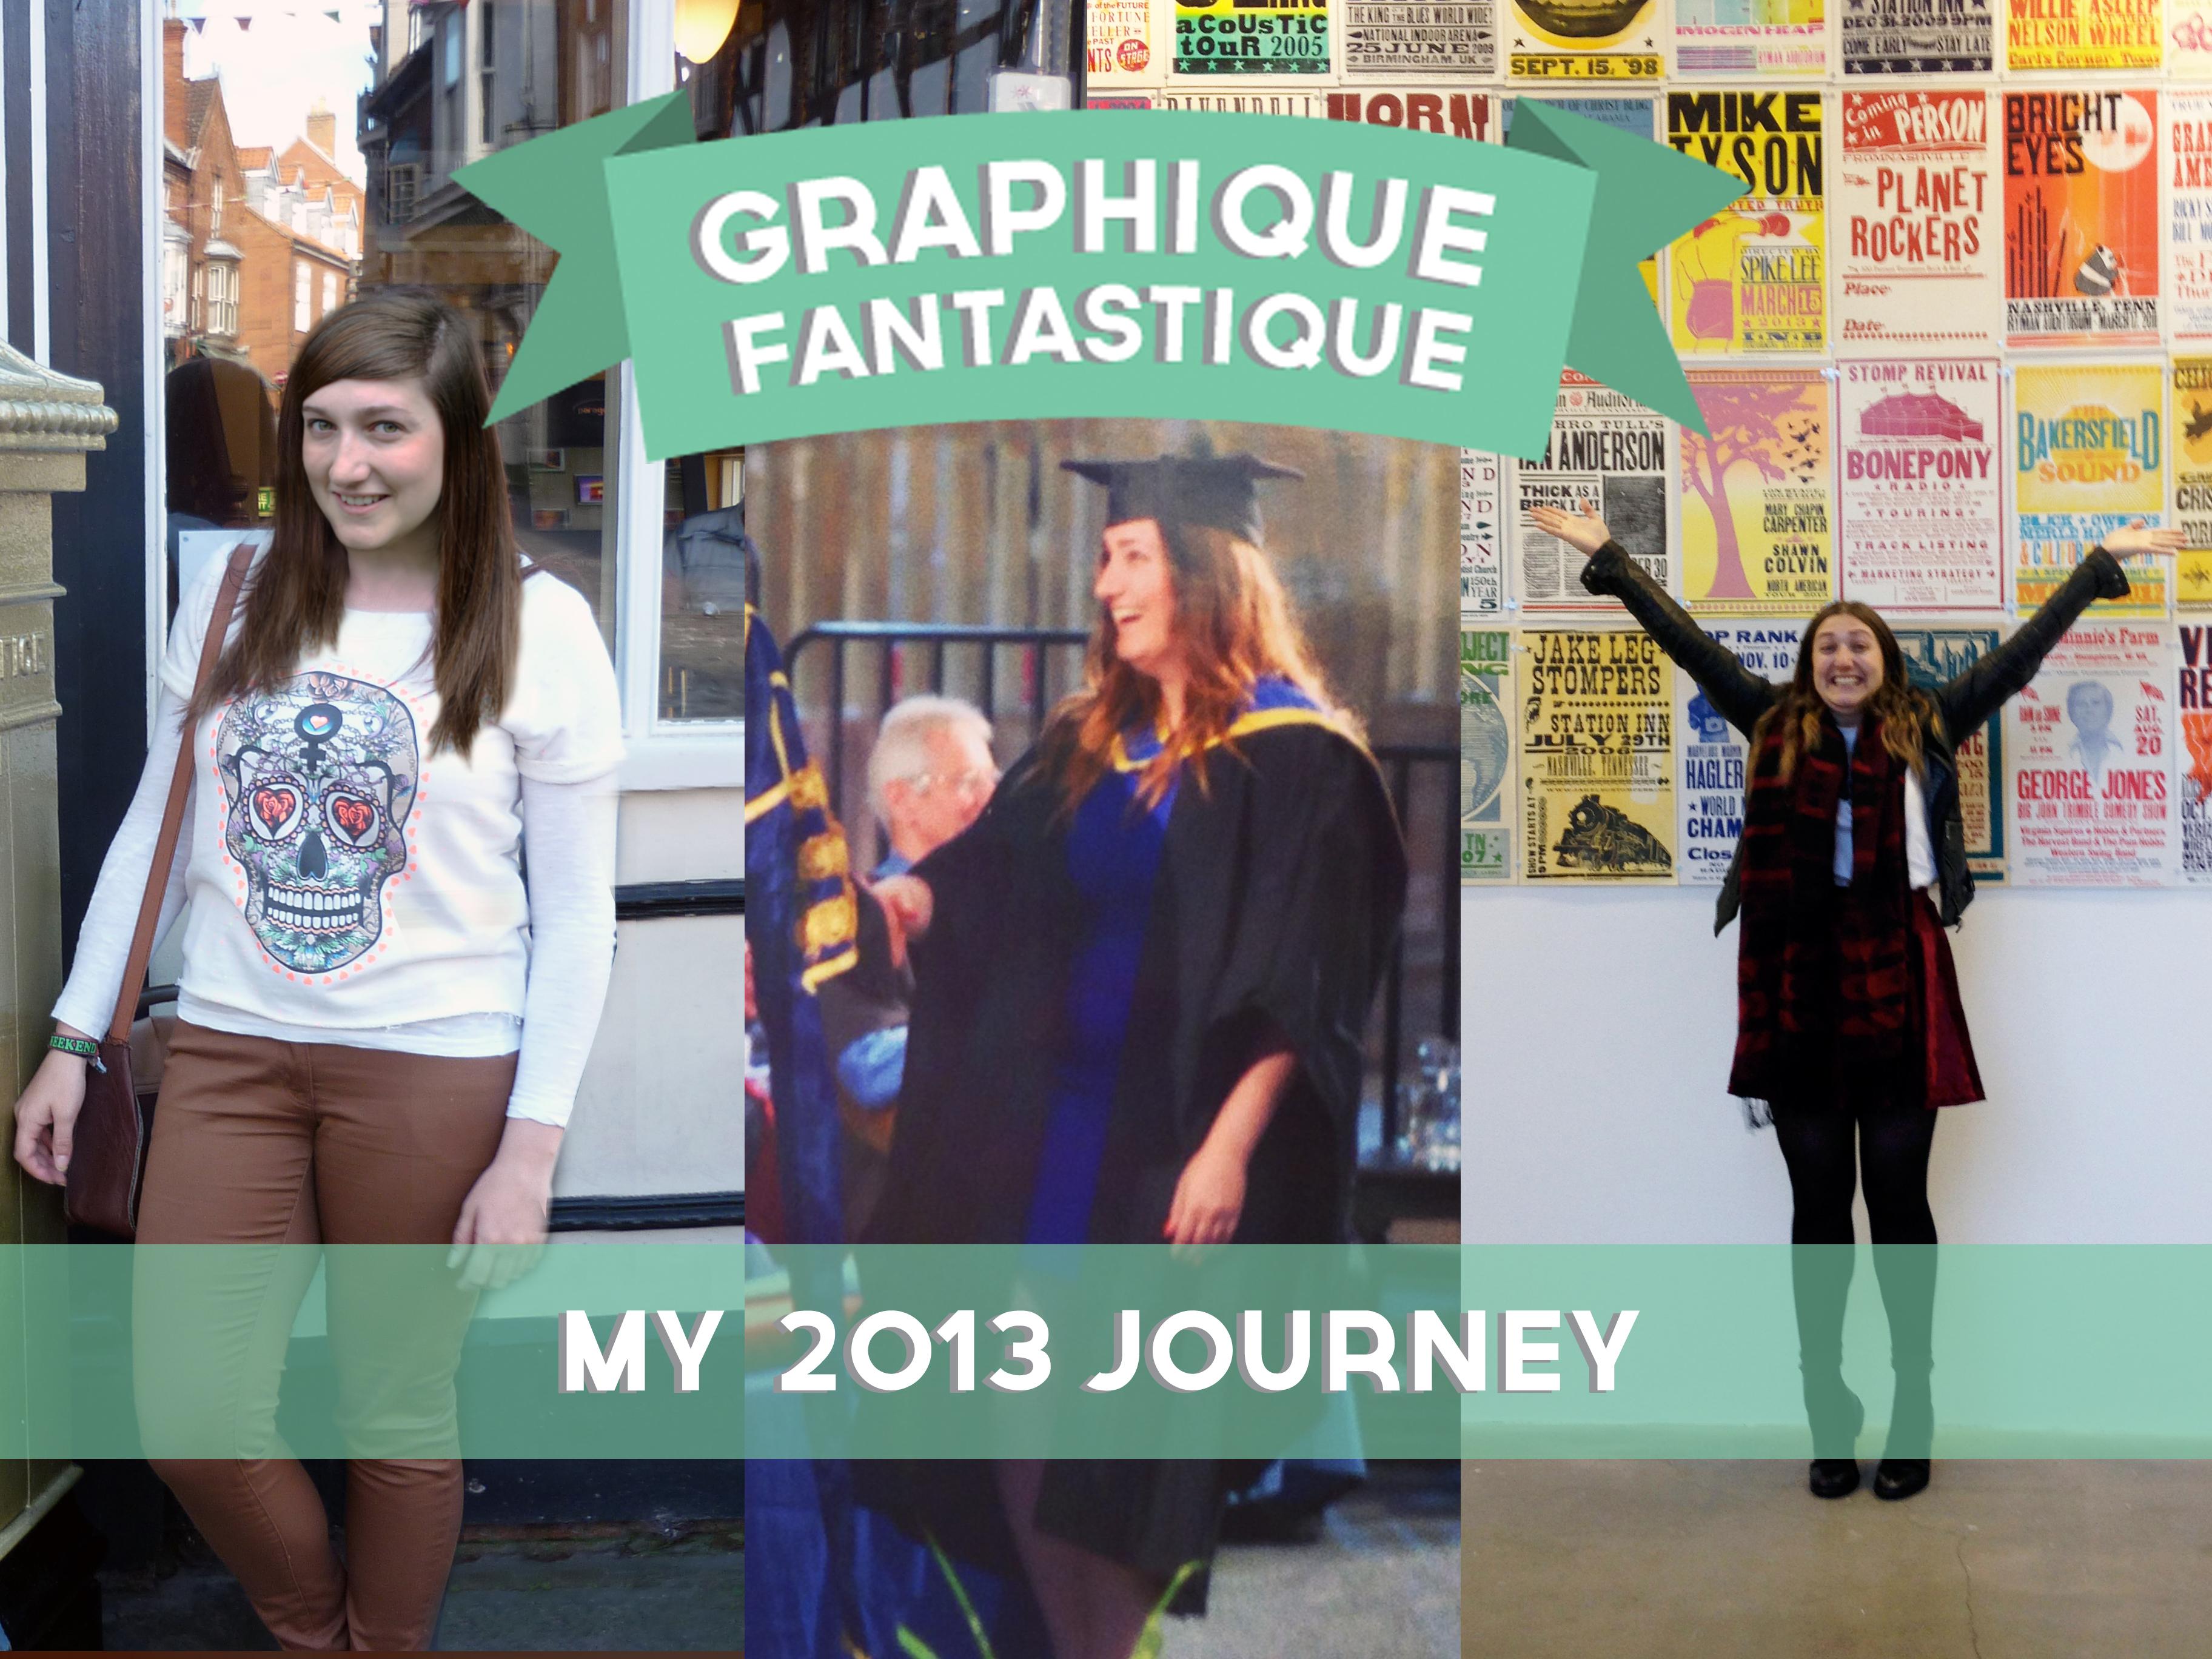 http://graphiquefantastique.com/wp-content/uploads/2013/12/top-2013f.jpg